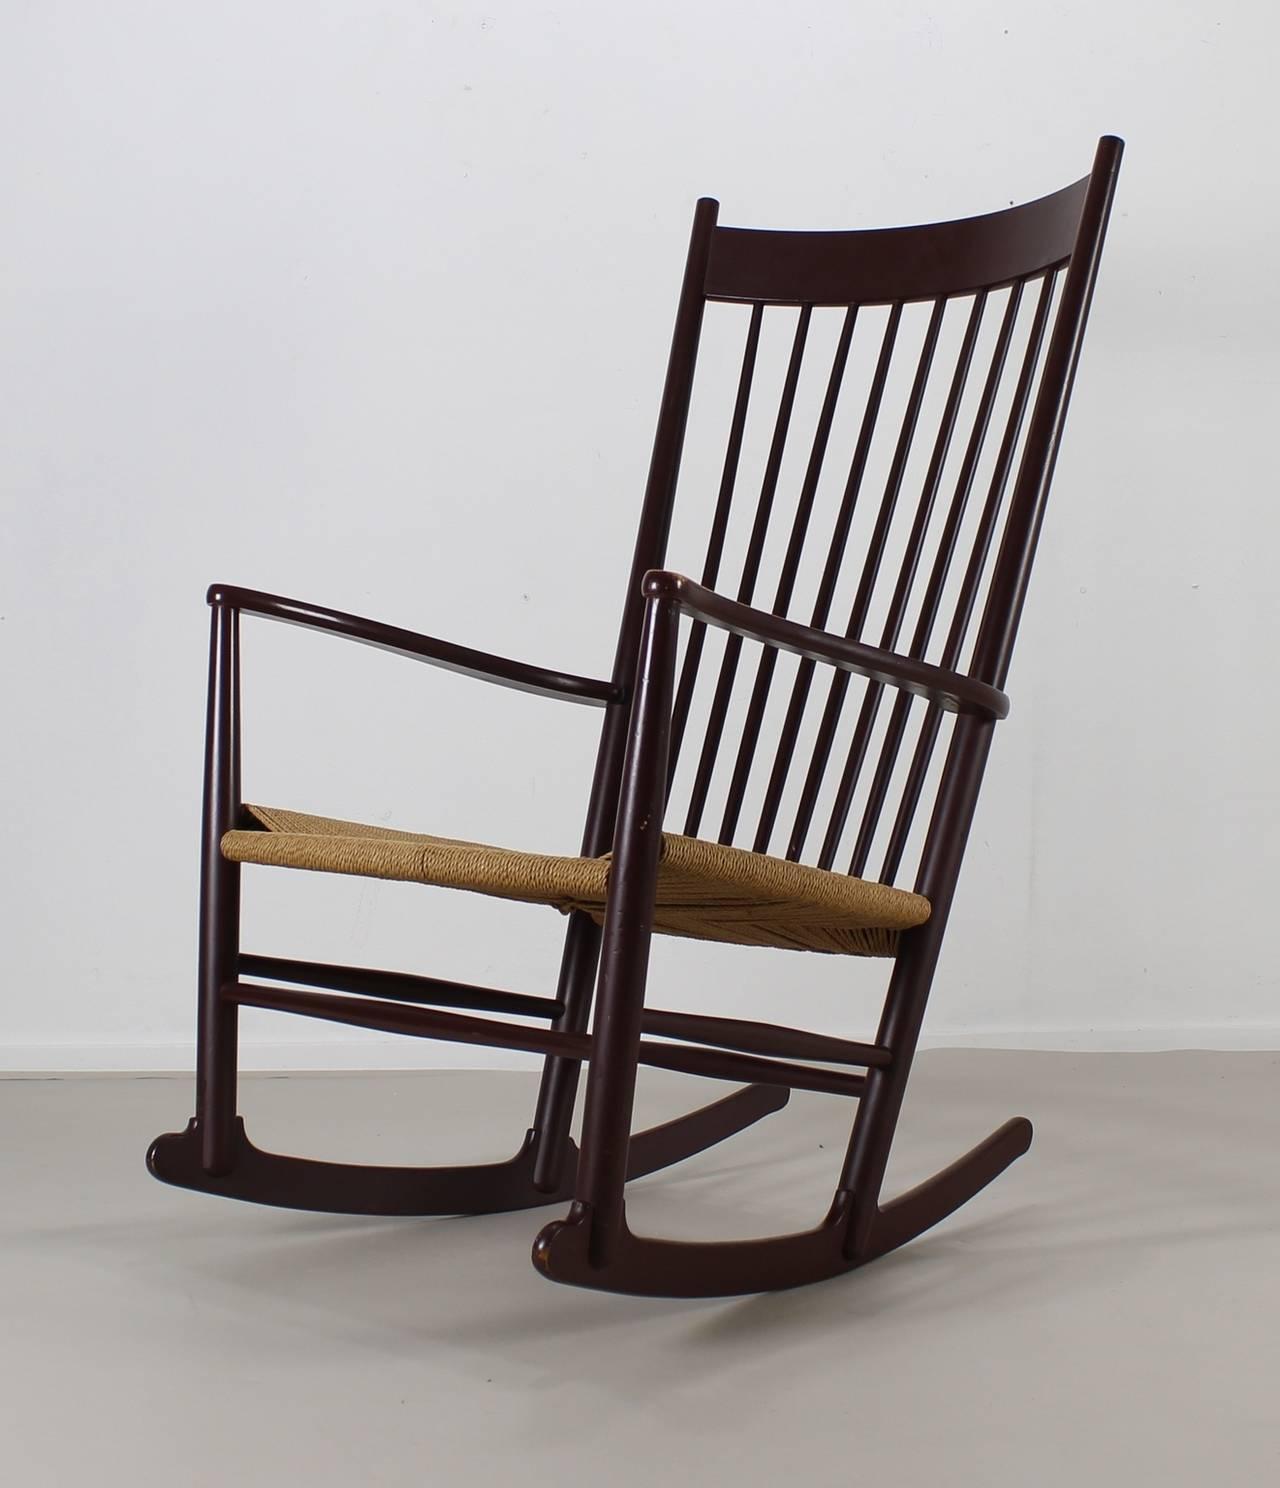 hans wegner rocking chair baby high chairs at walmart for fdb møbler denmark 1stdibs